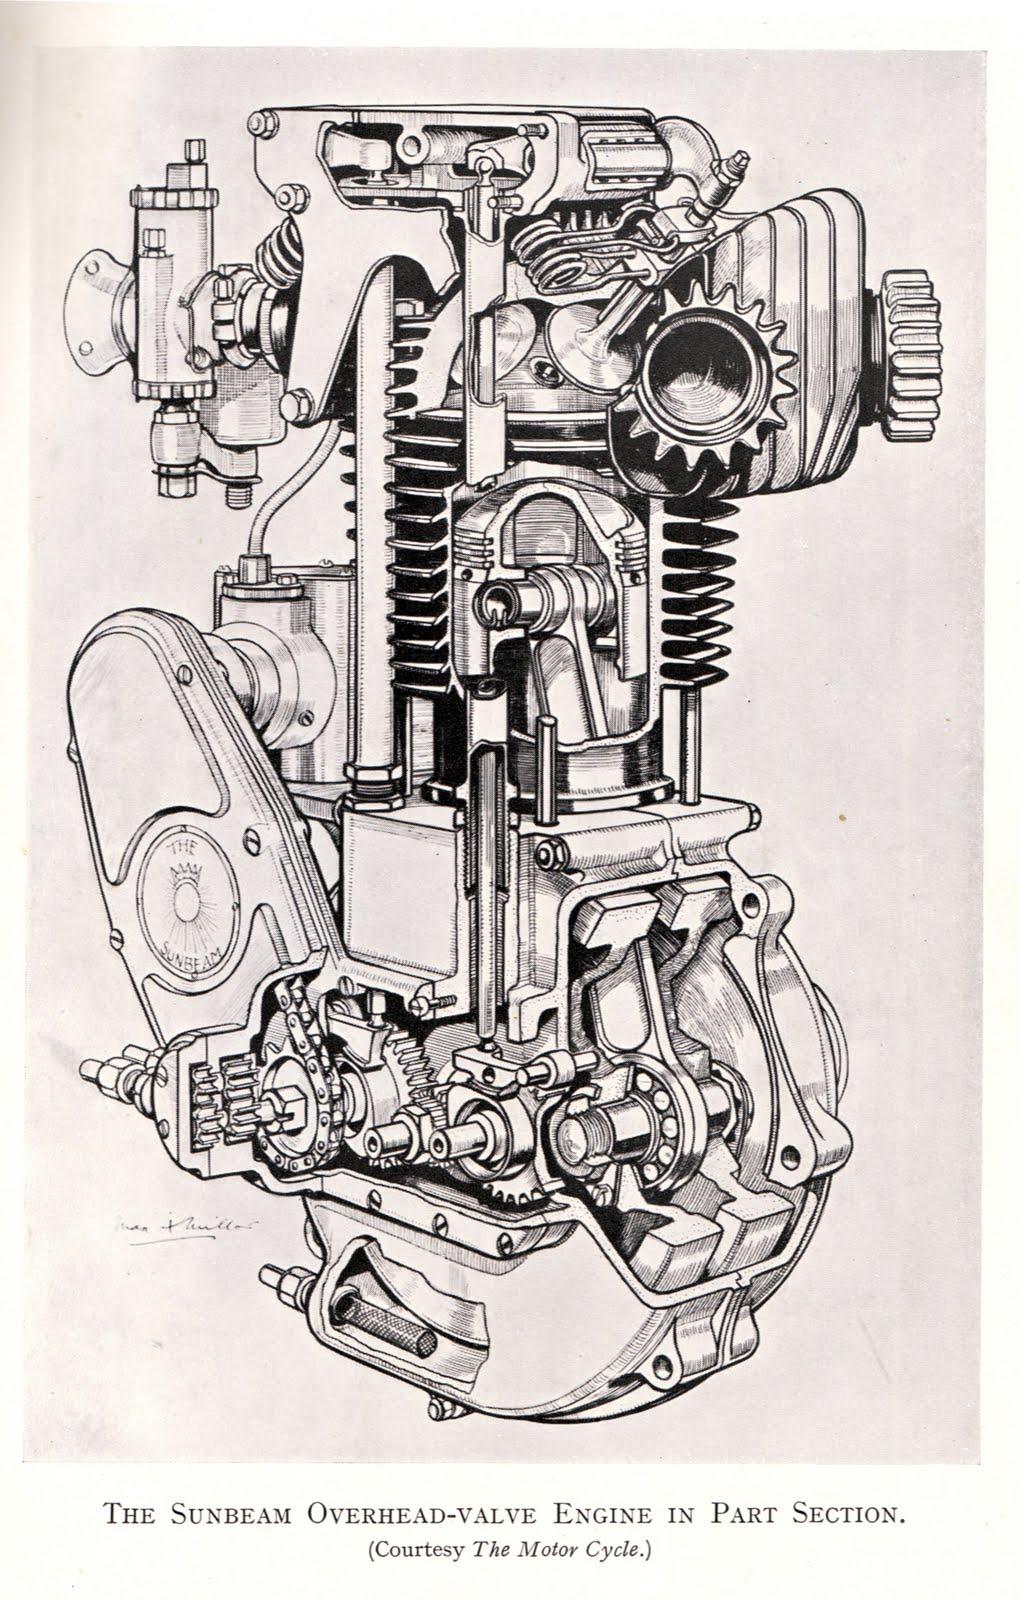 Sunbeam Model 90 Engine Cutaway